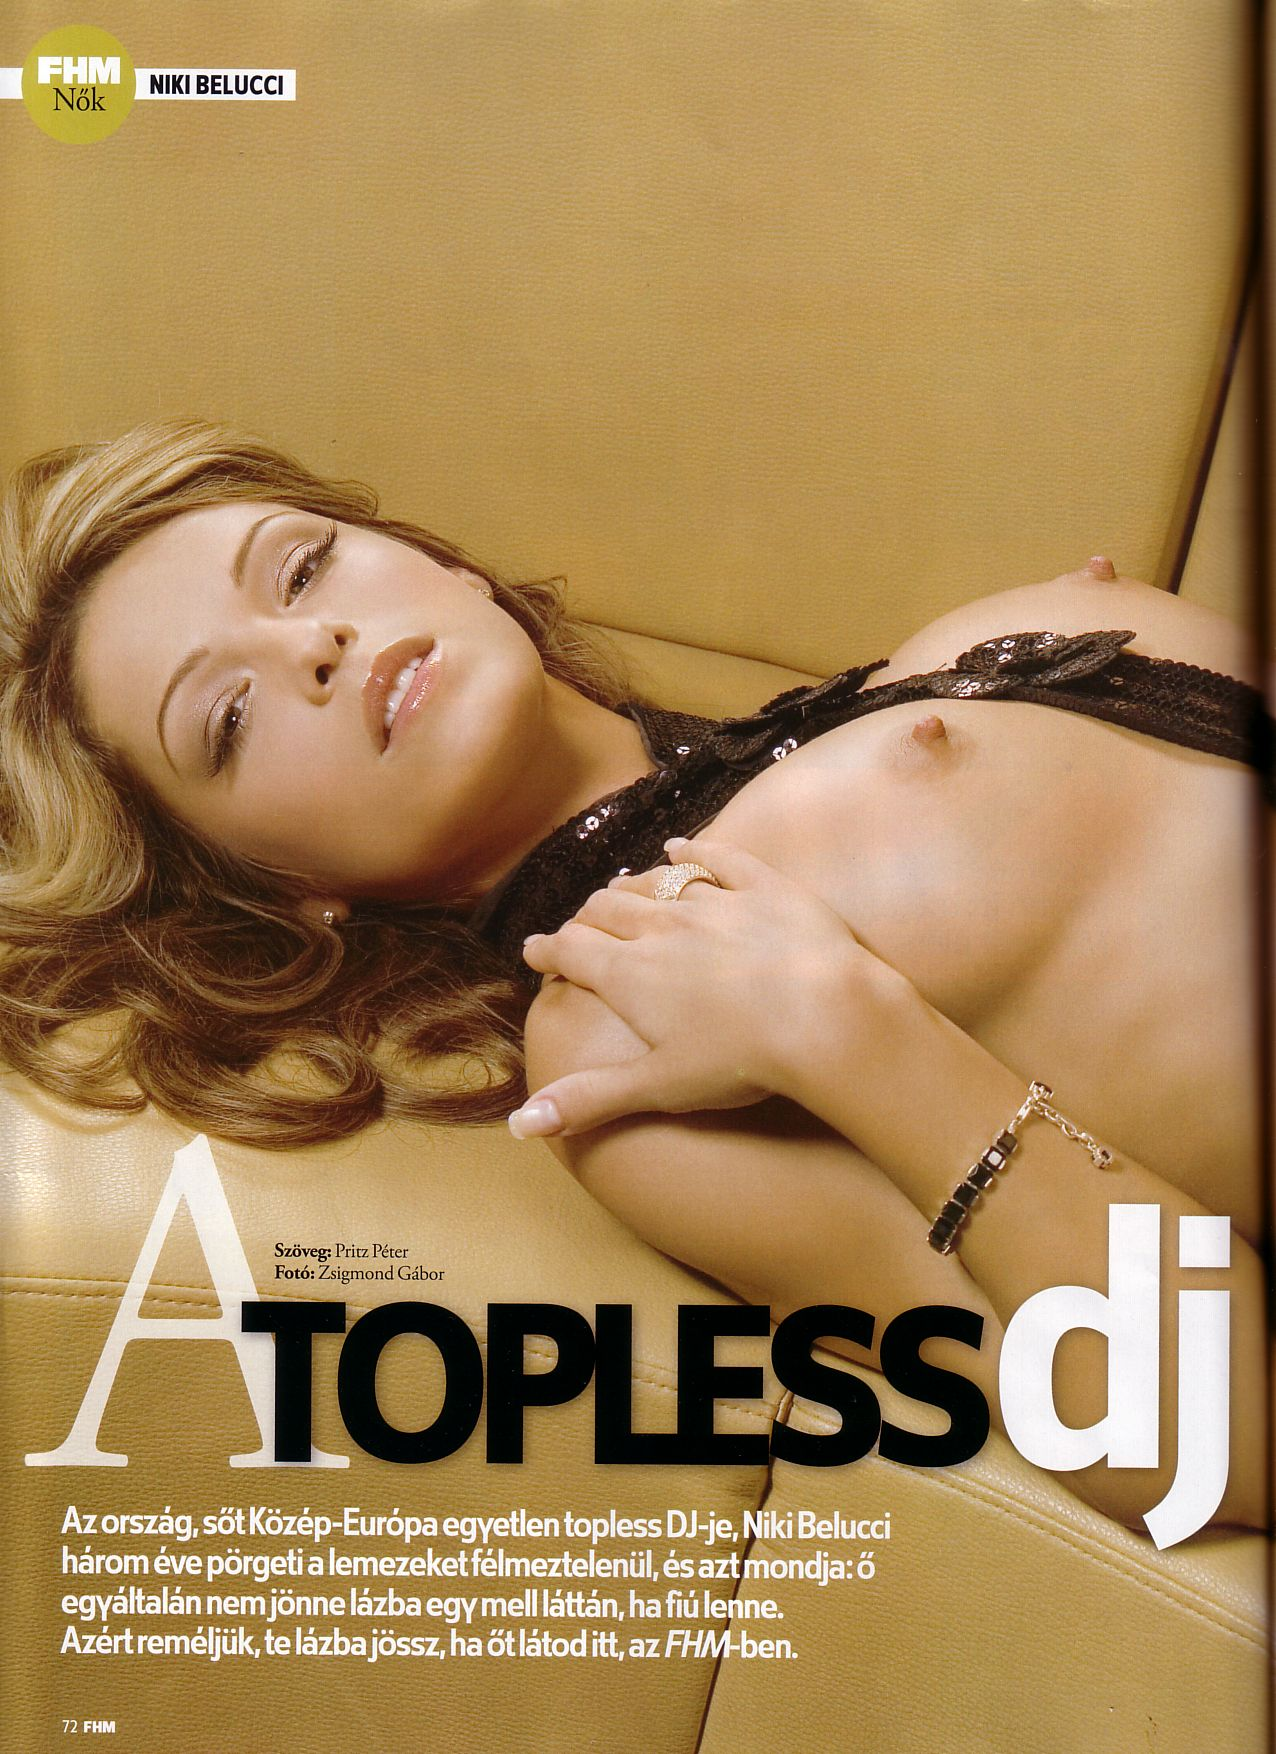 37947_nikki_belucci_topless_dj_2_123_886lo.jpg